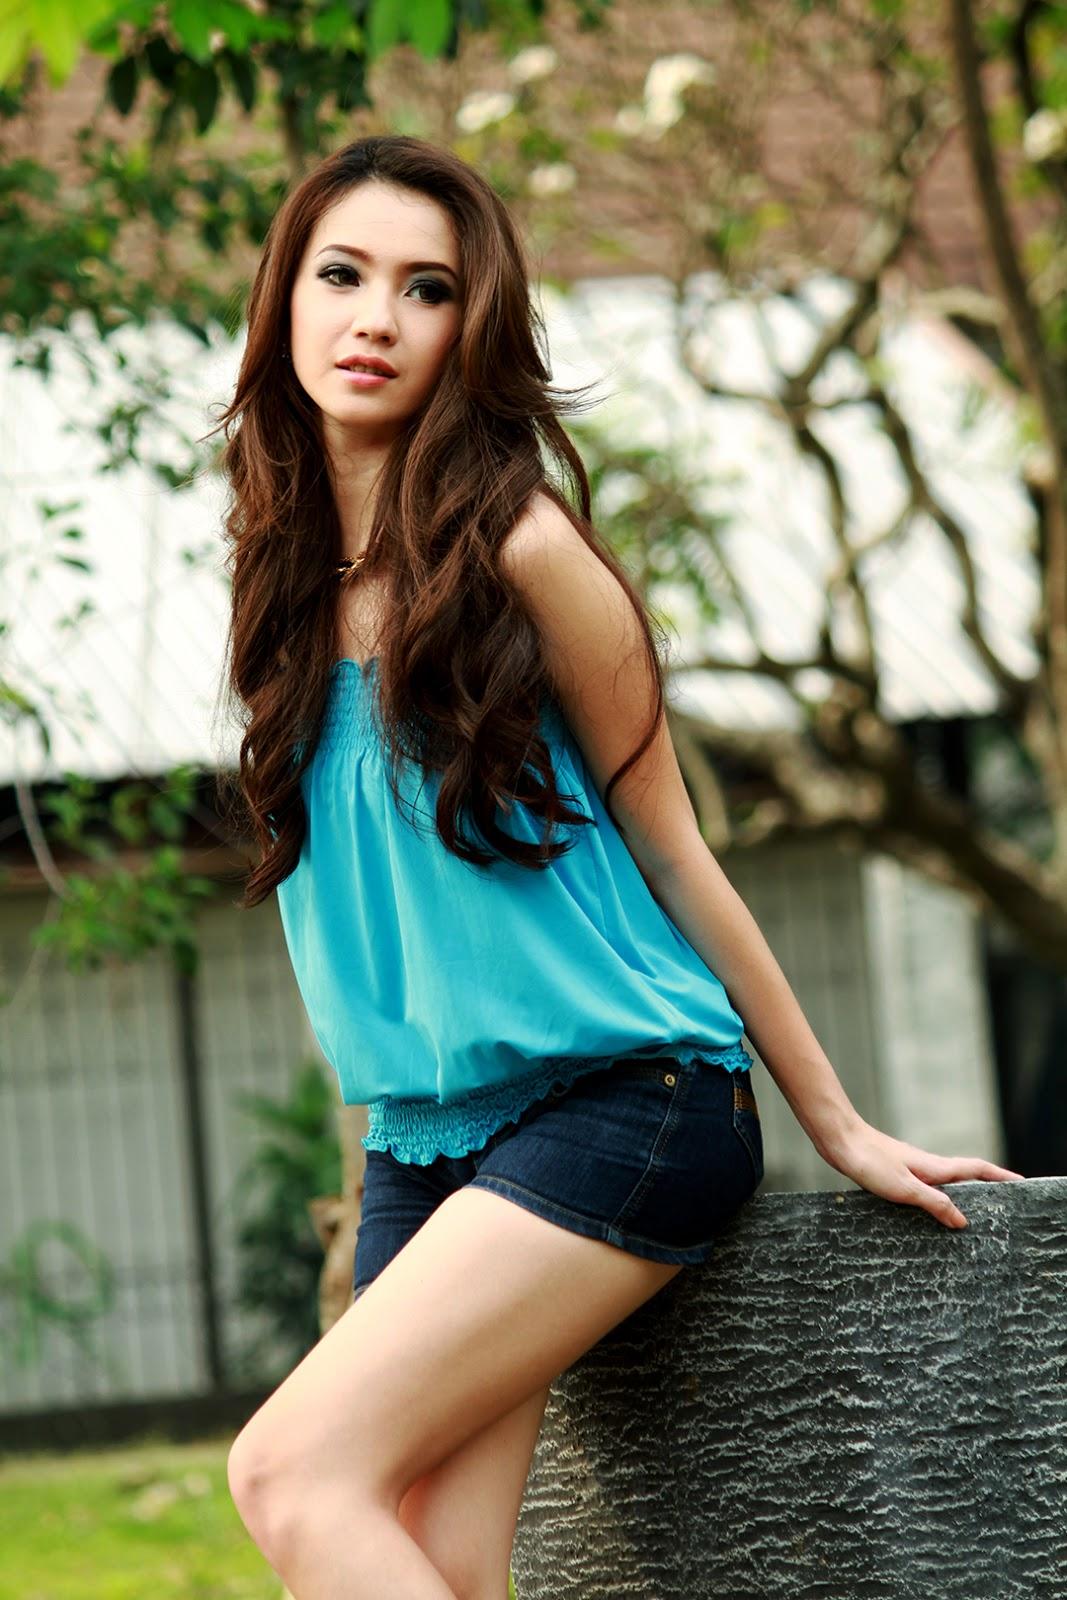 konsep foto Model Winny Valencia baju kulit mulus putih